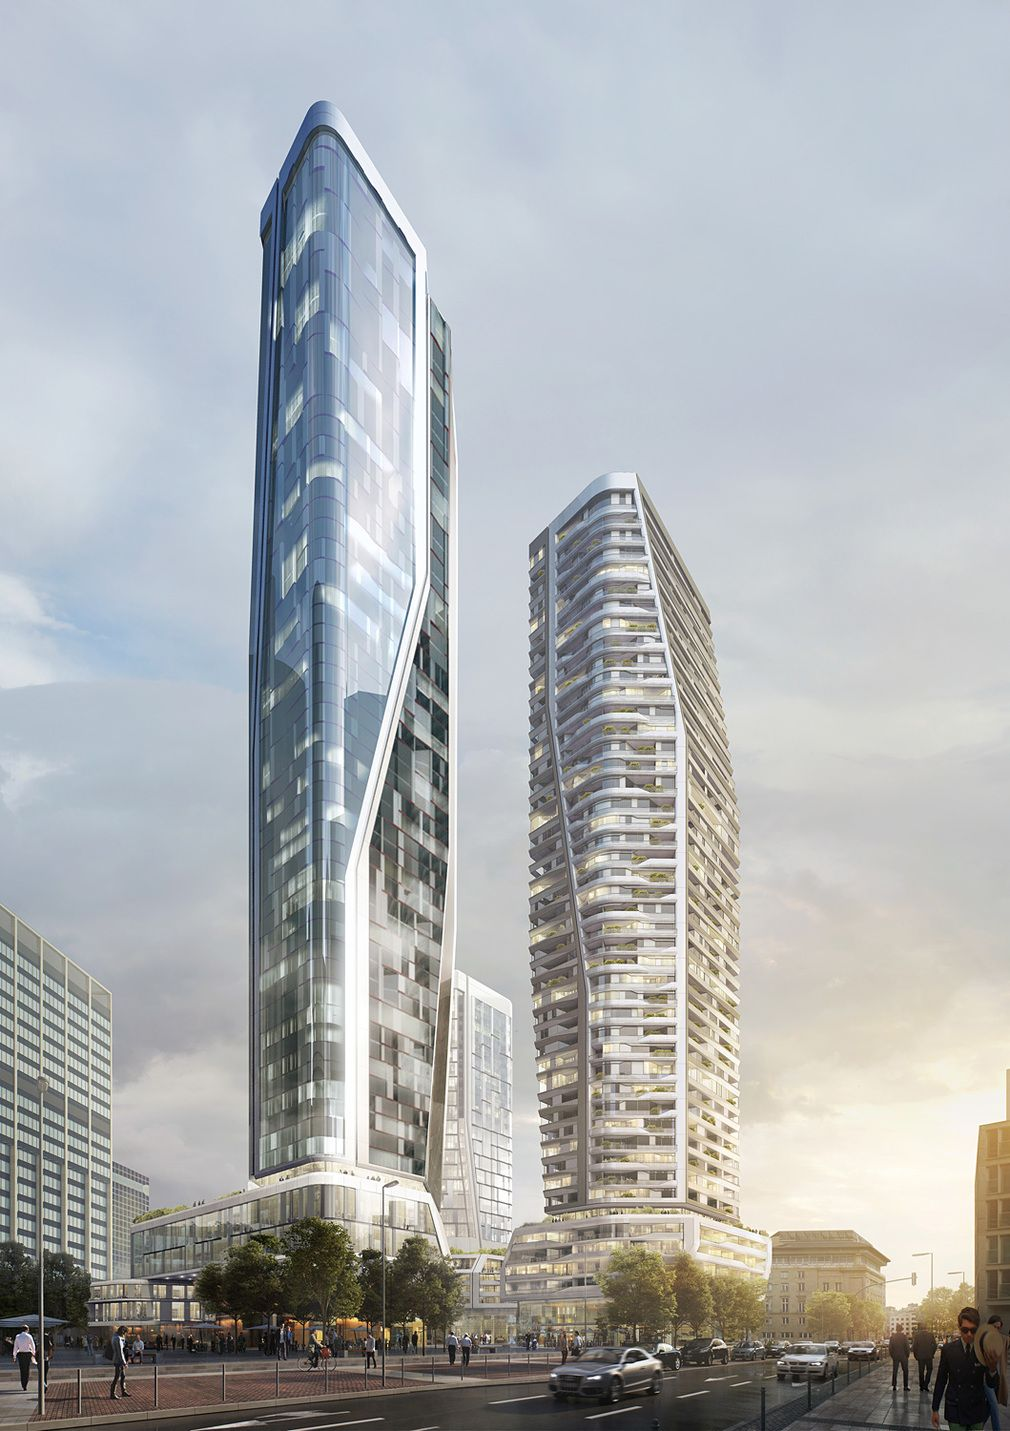 Unstudio Wins Architectural Competition For Deutsche Bank Site Revival In Frankfurt Edificios Modernos Torre Arquitectura Y Edificios